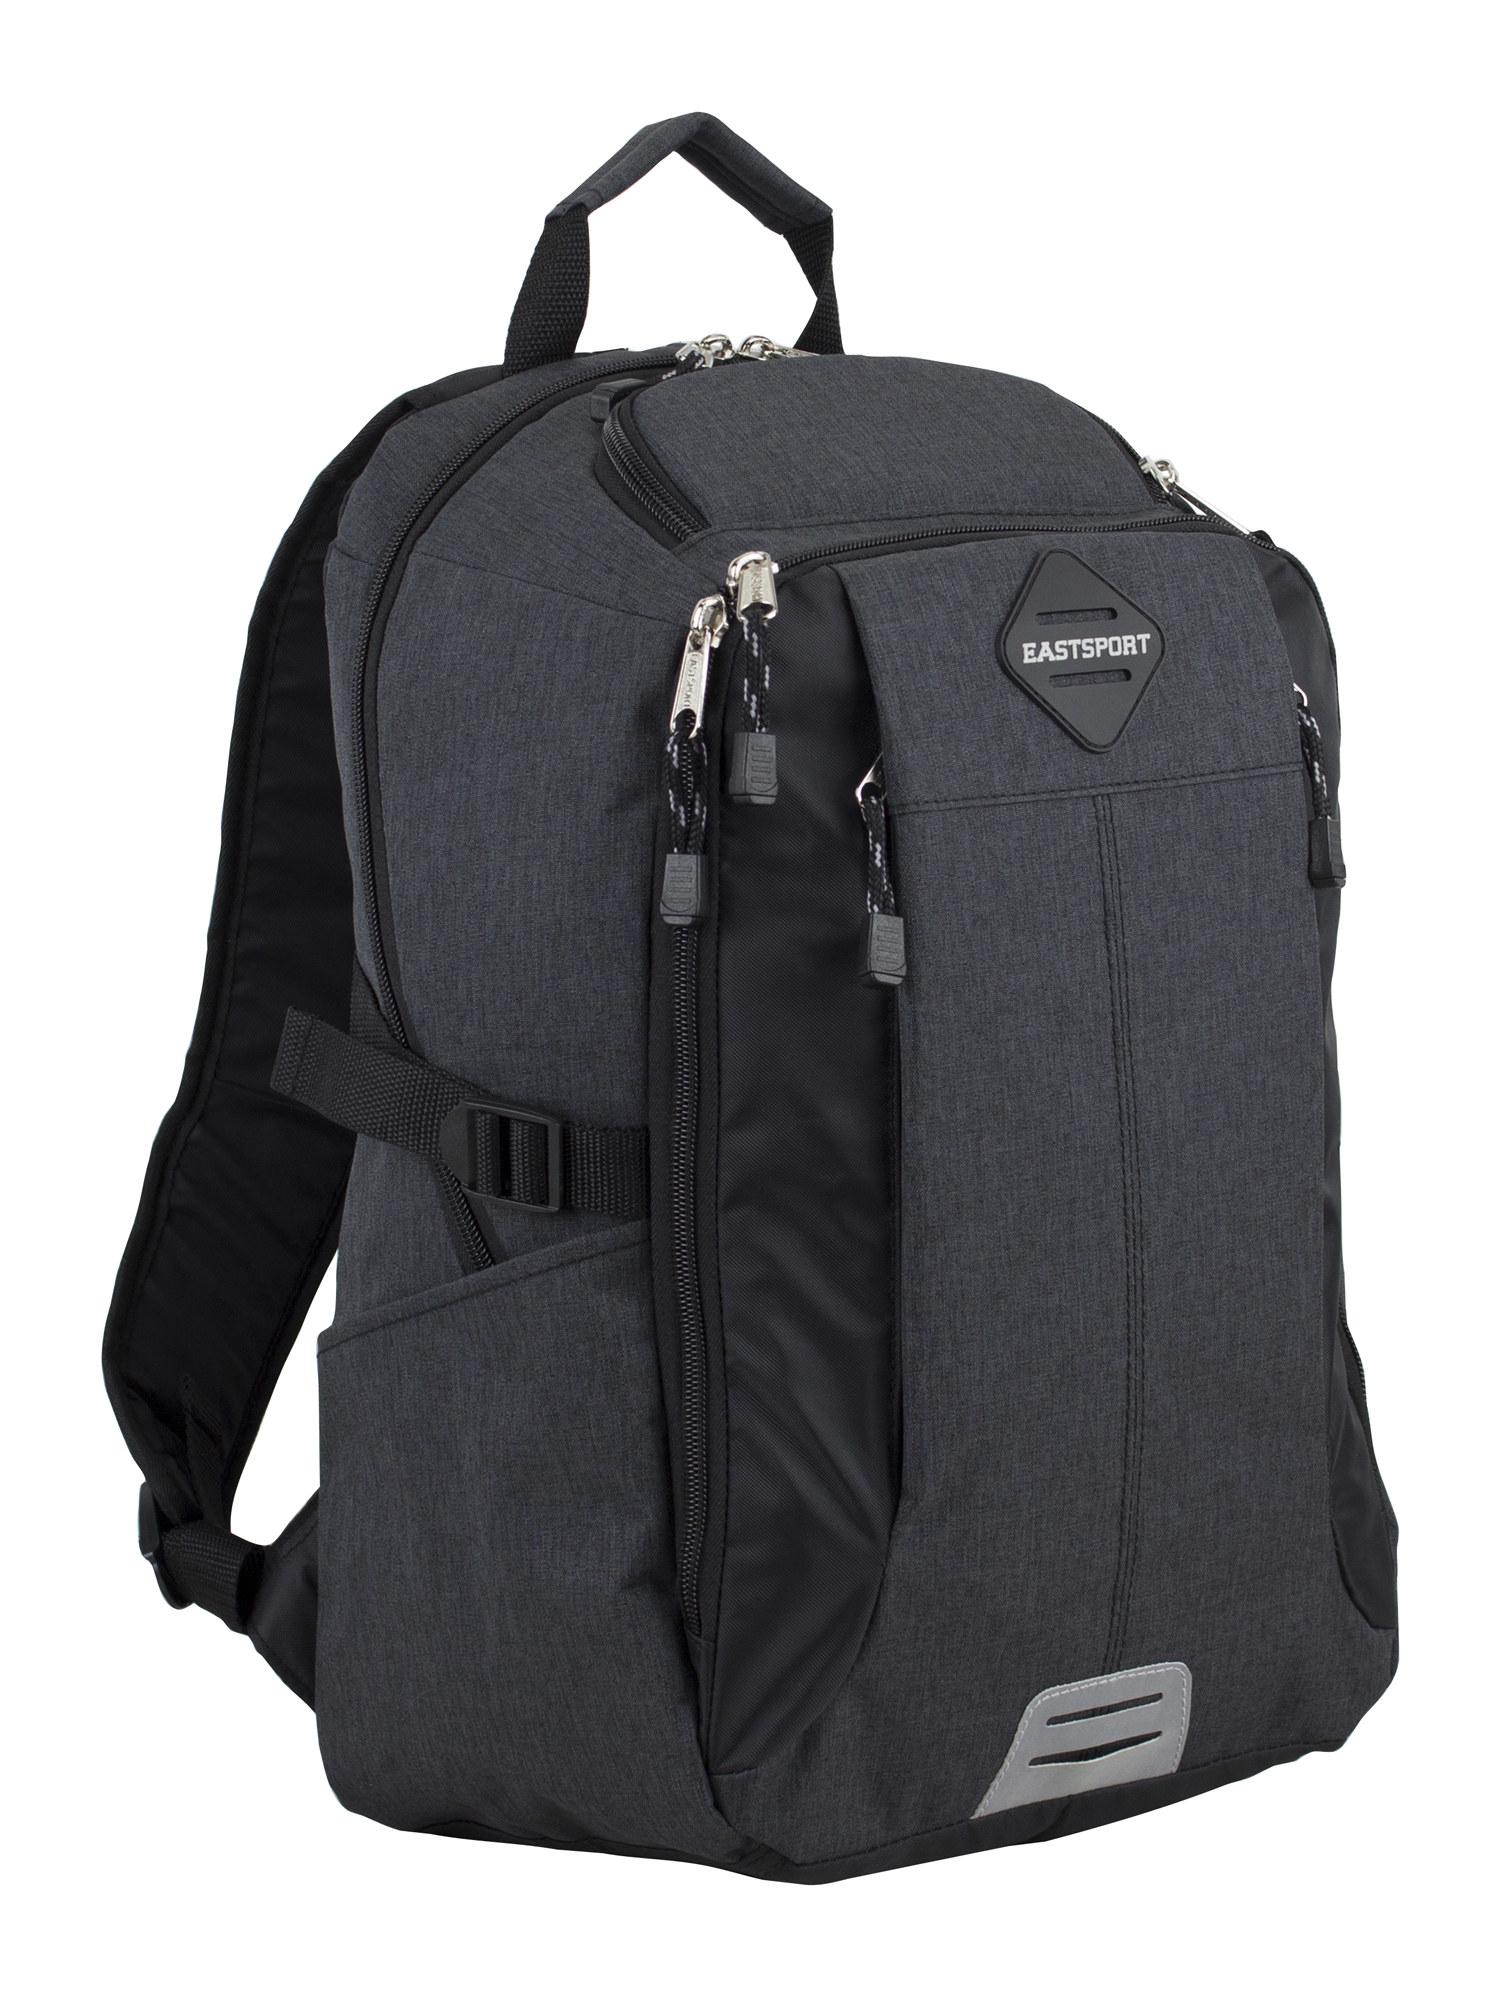 The black backpack